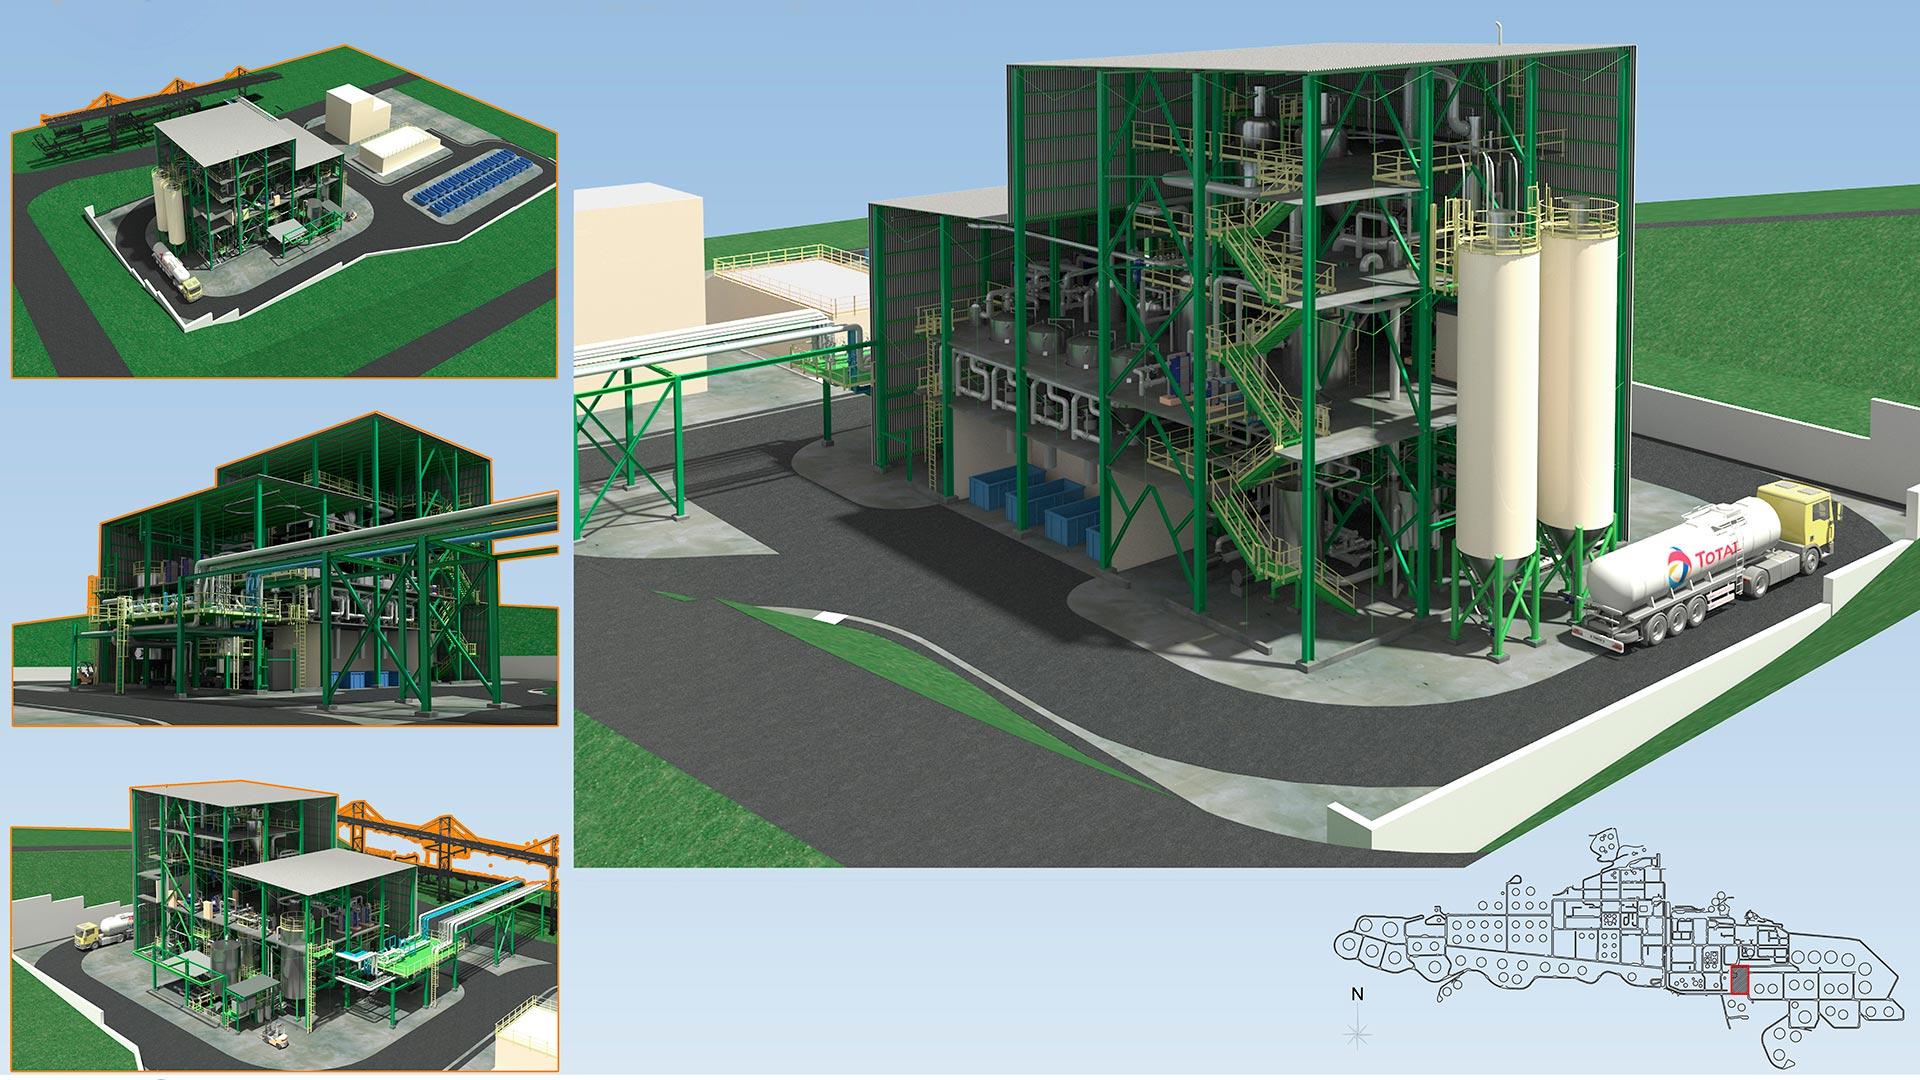 ARQUITECTURA INDUSTRIAL 3D | Render para empresas